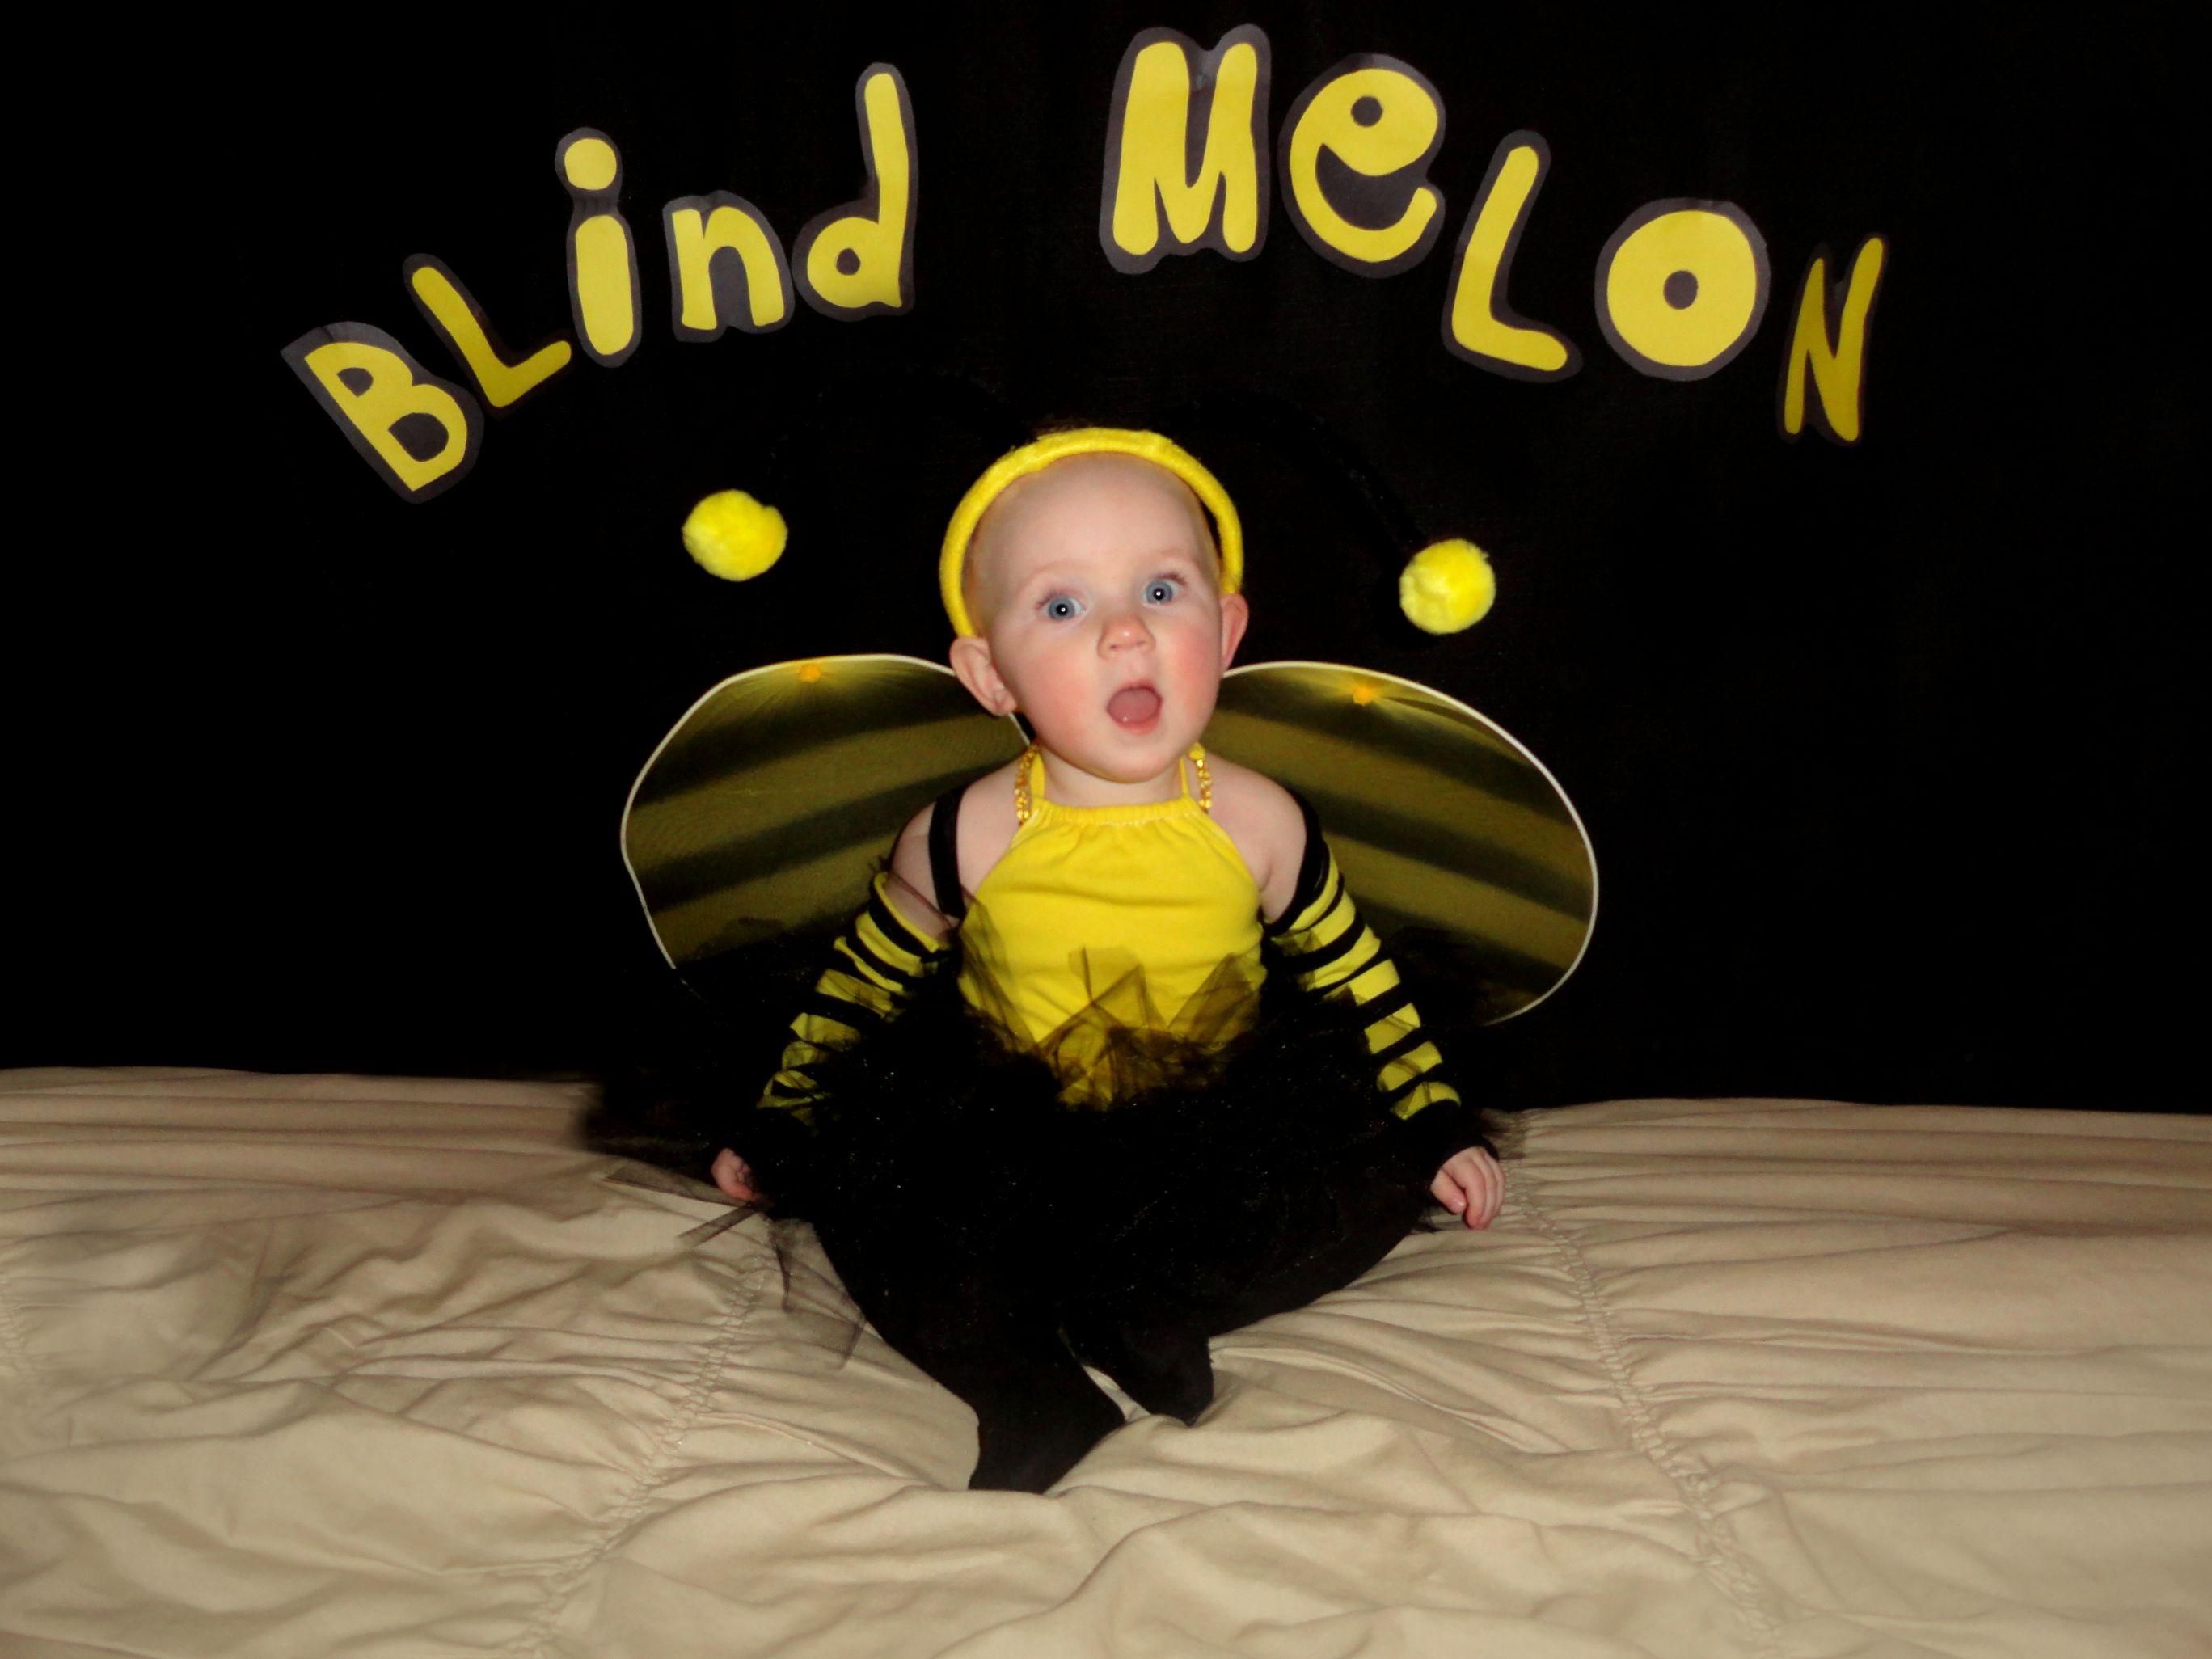 blind-melon-bee-girl-video-daisychain-pussy-fuck